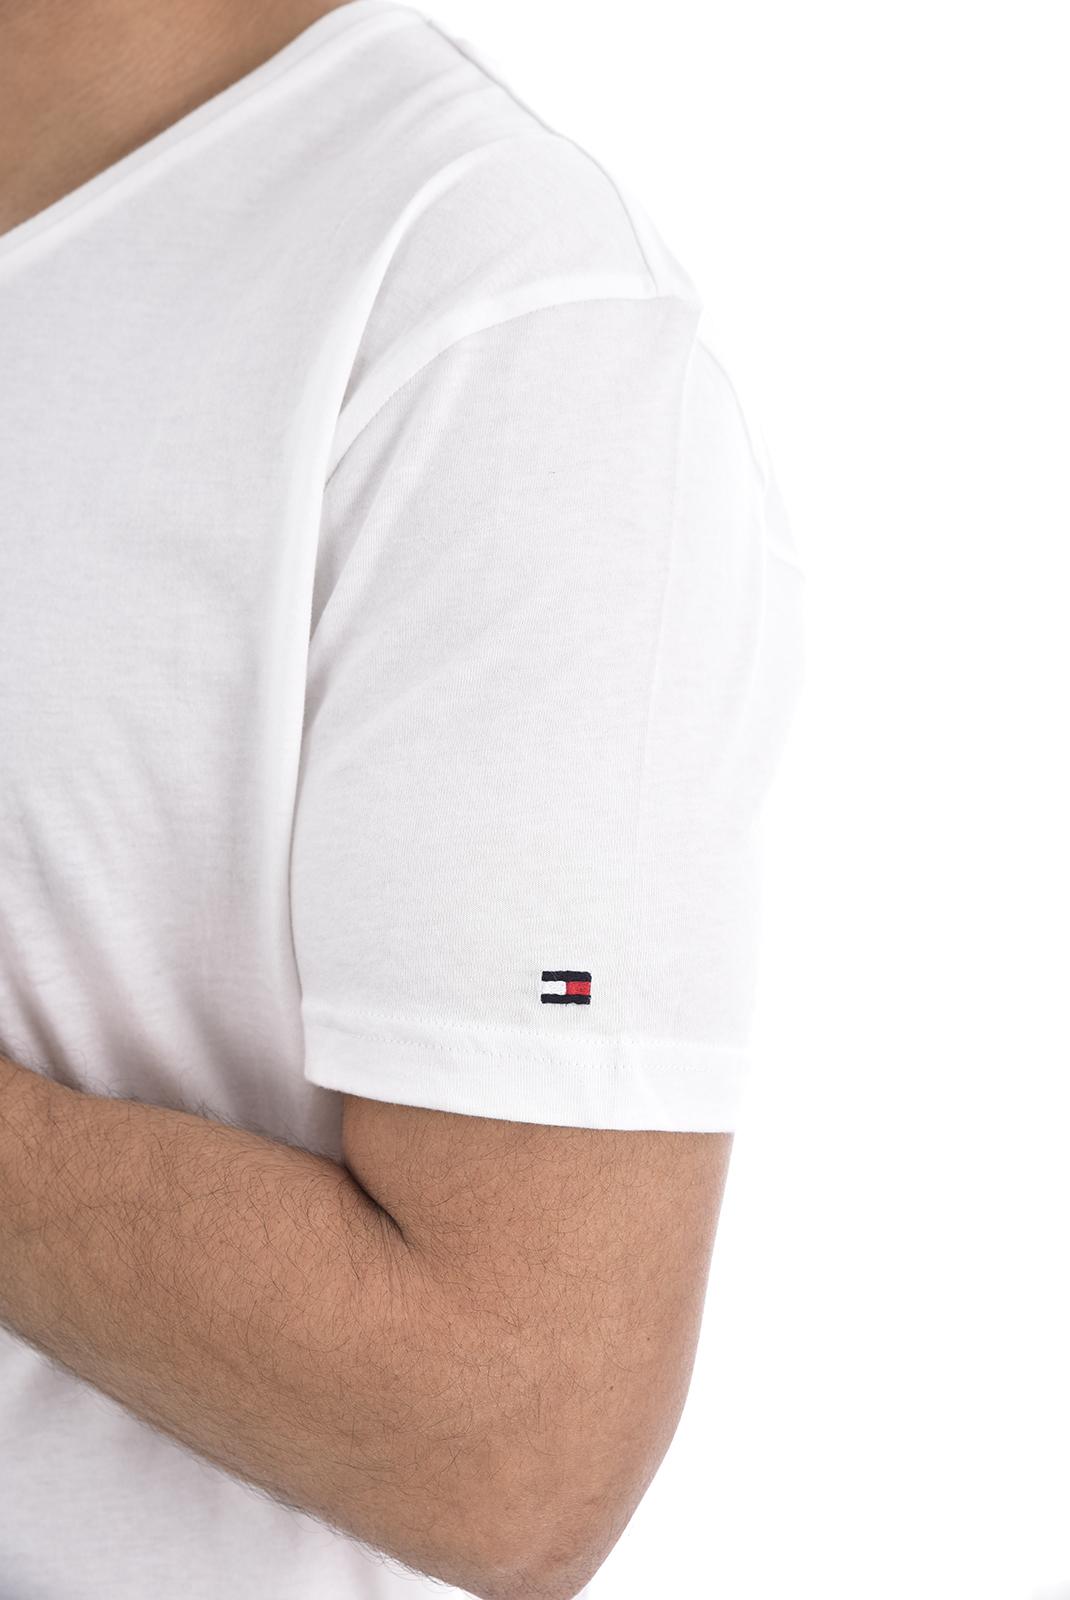 T-S manches courtes  Tommy Jeans UM01029 100 WHITE